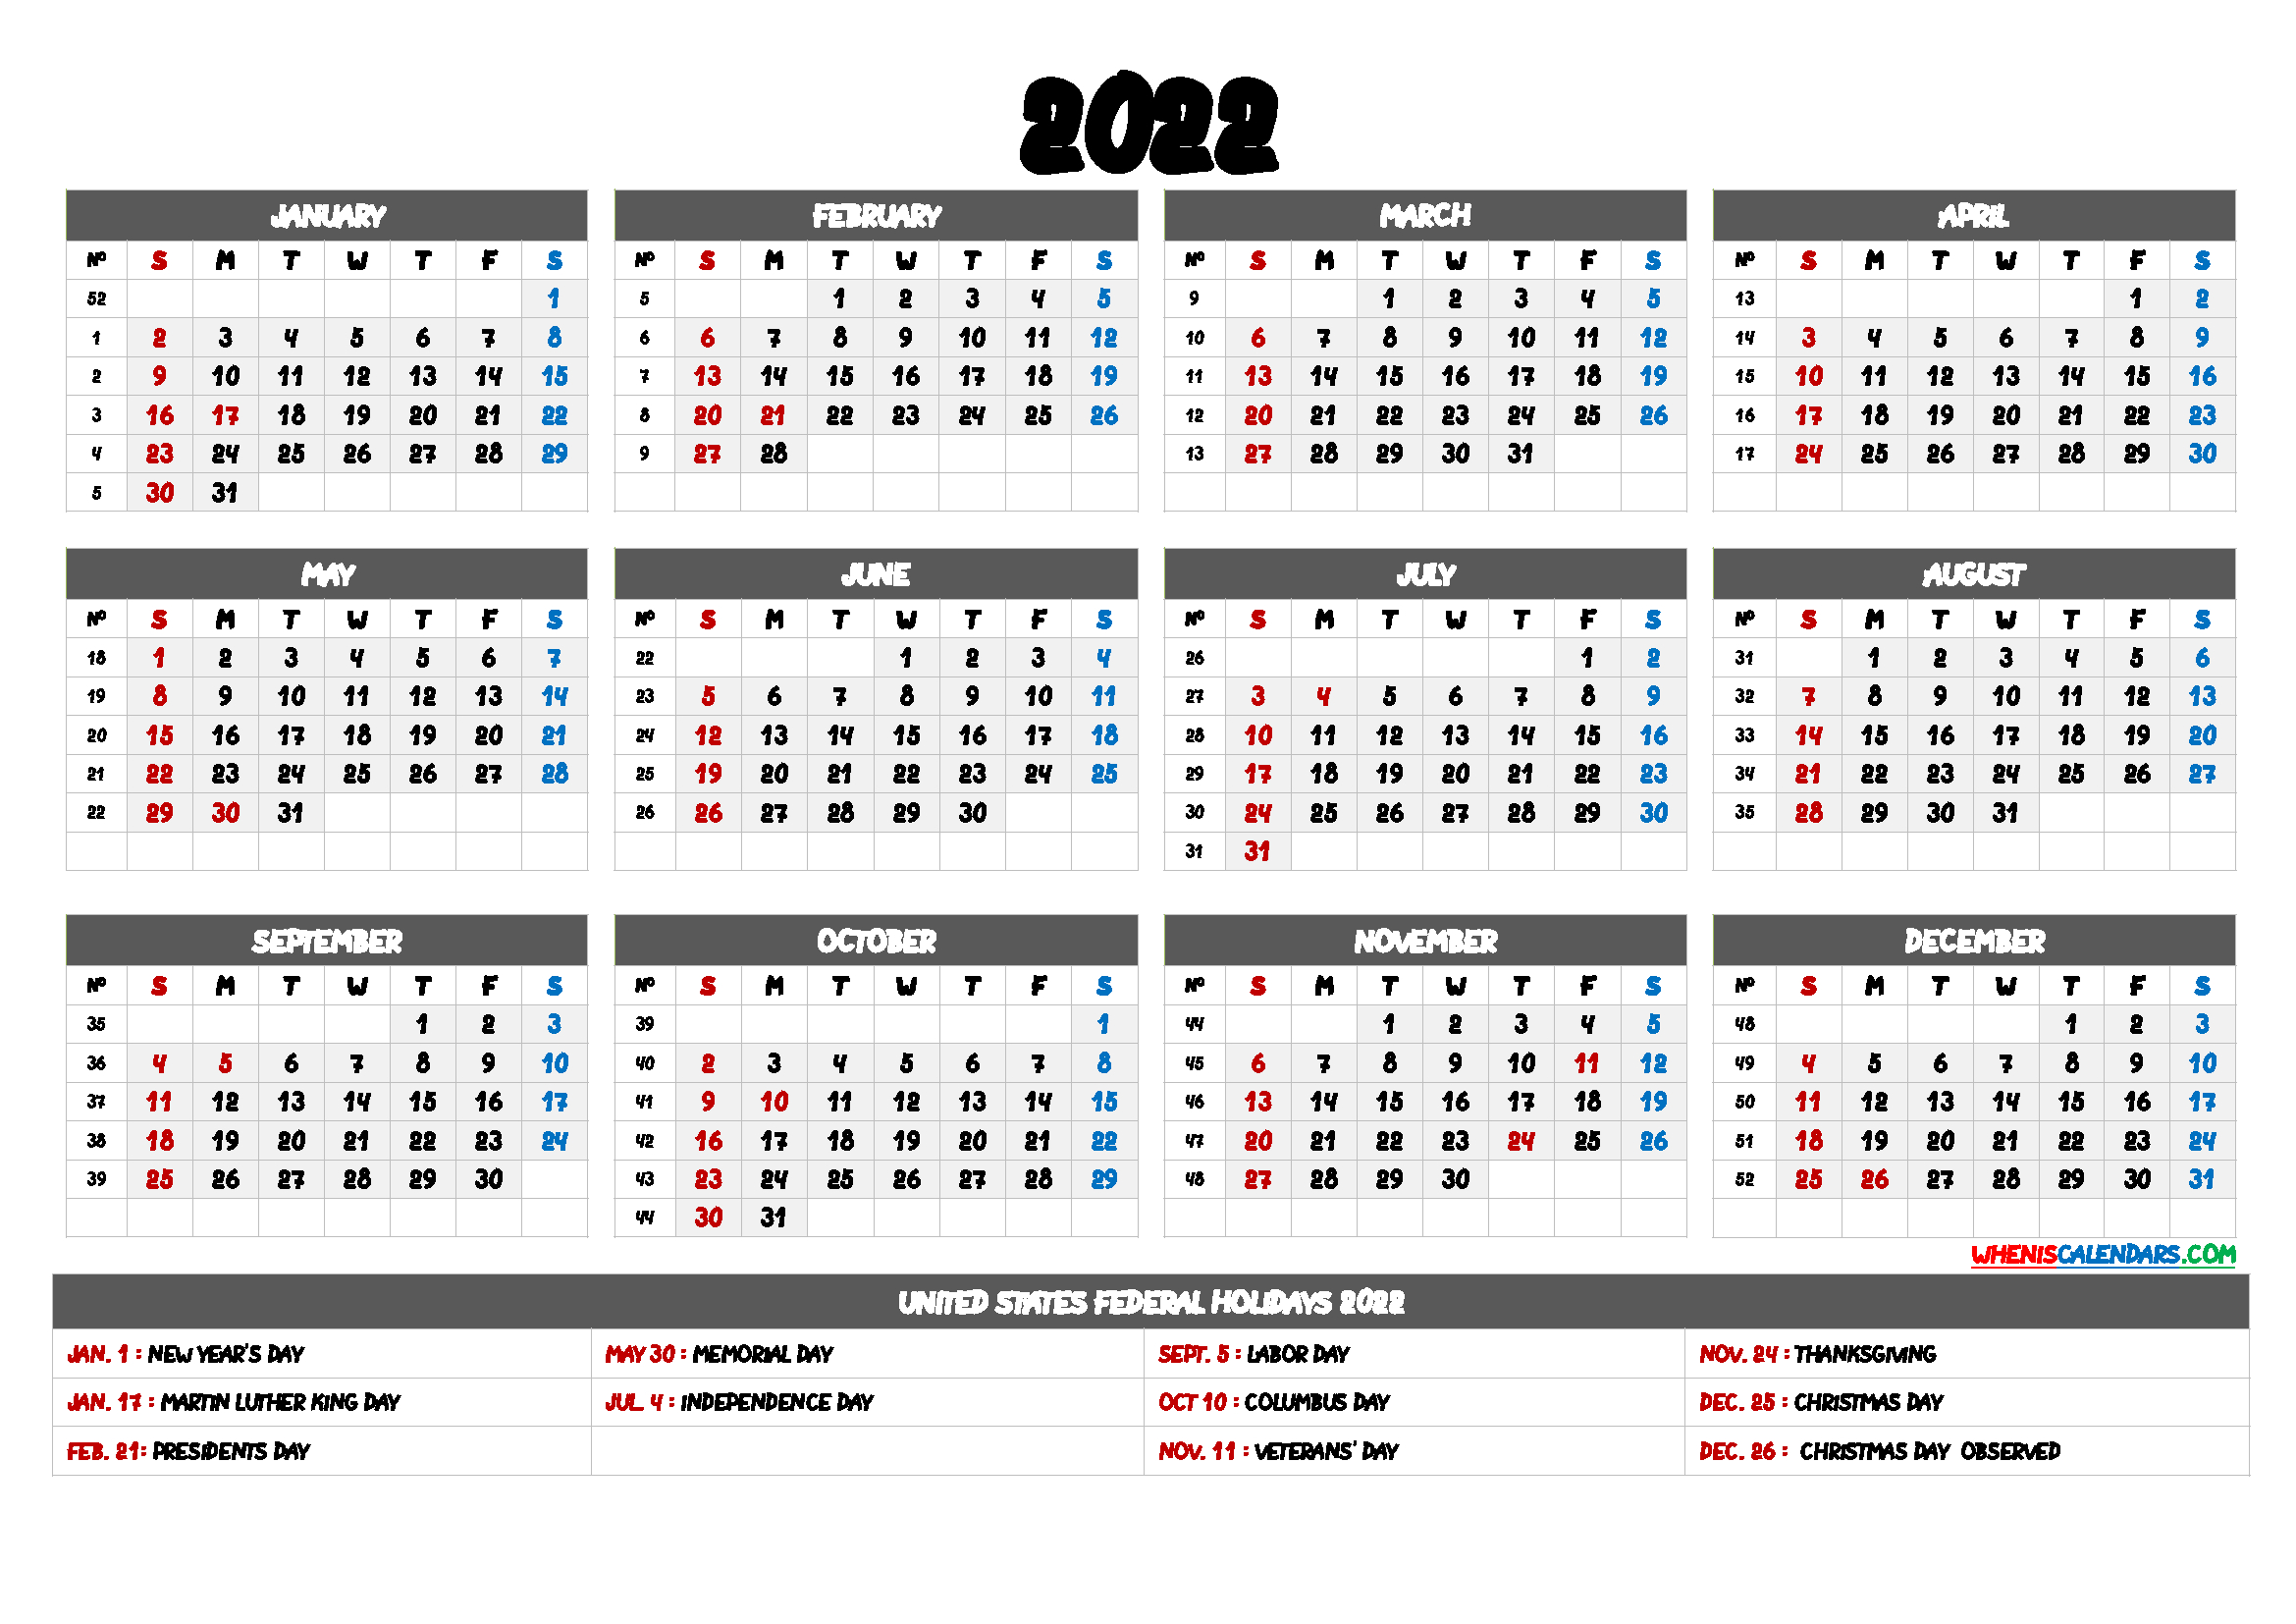 20+ 2022 Holidays - Free Download Printable Calendar intended for Julian Date Calendar For 2022